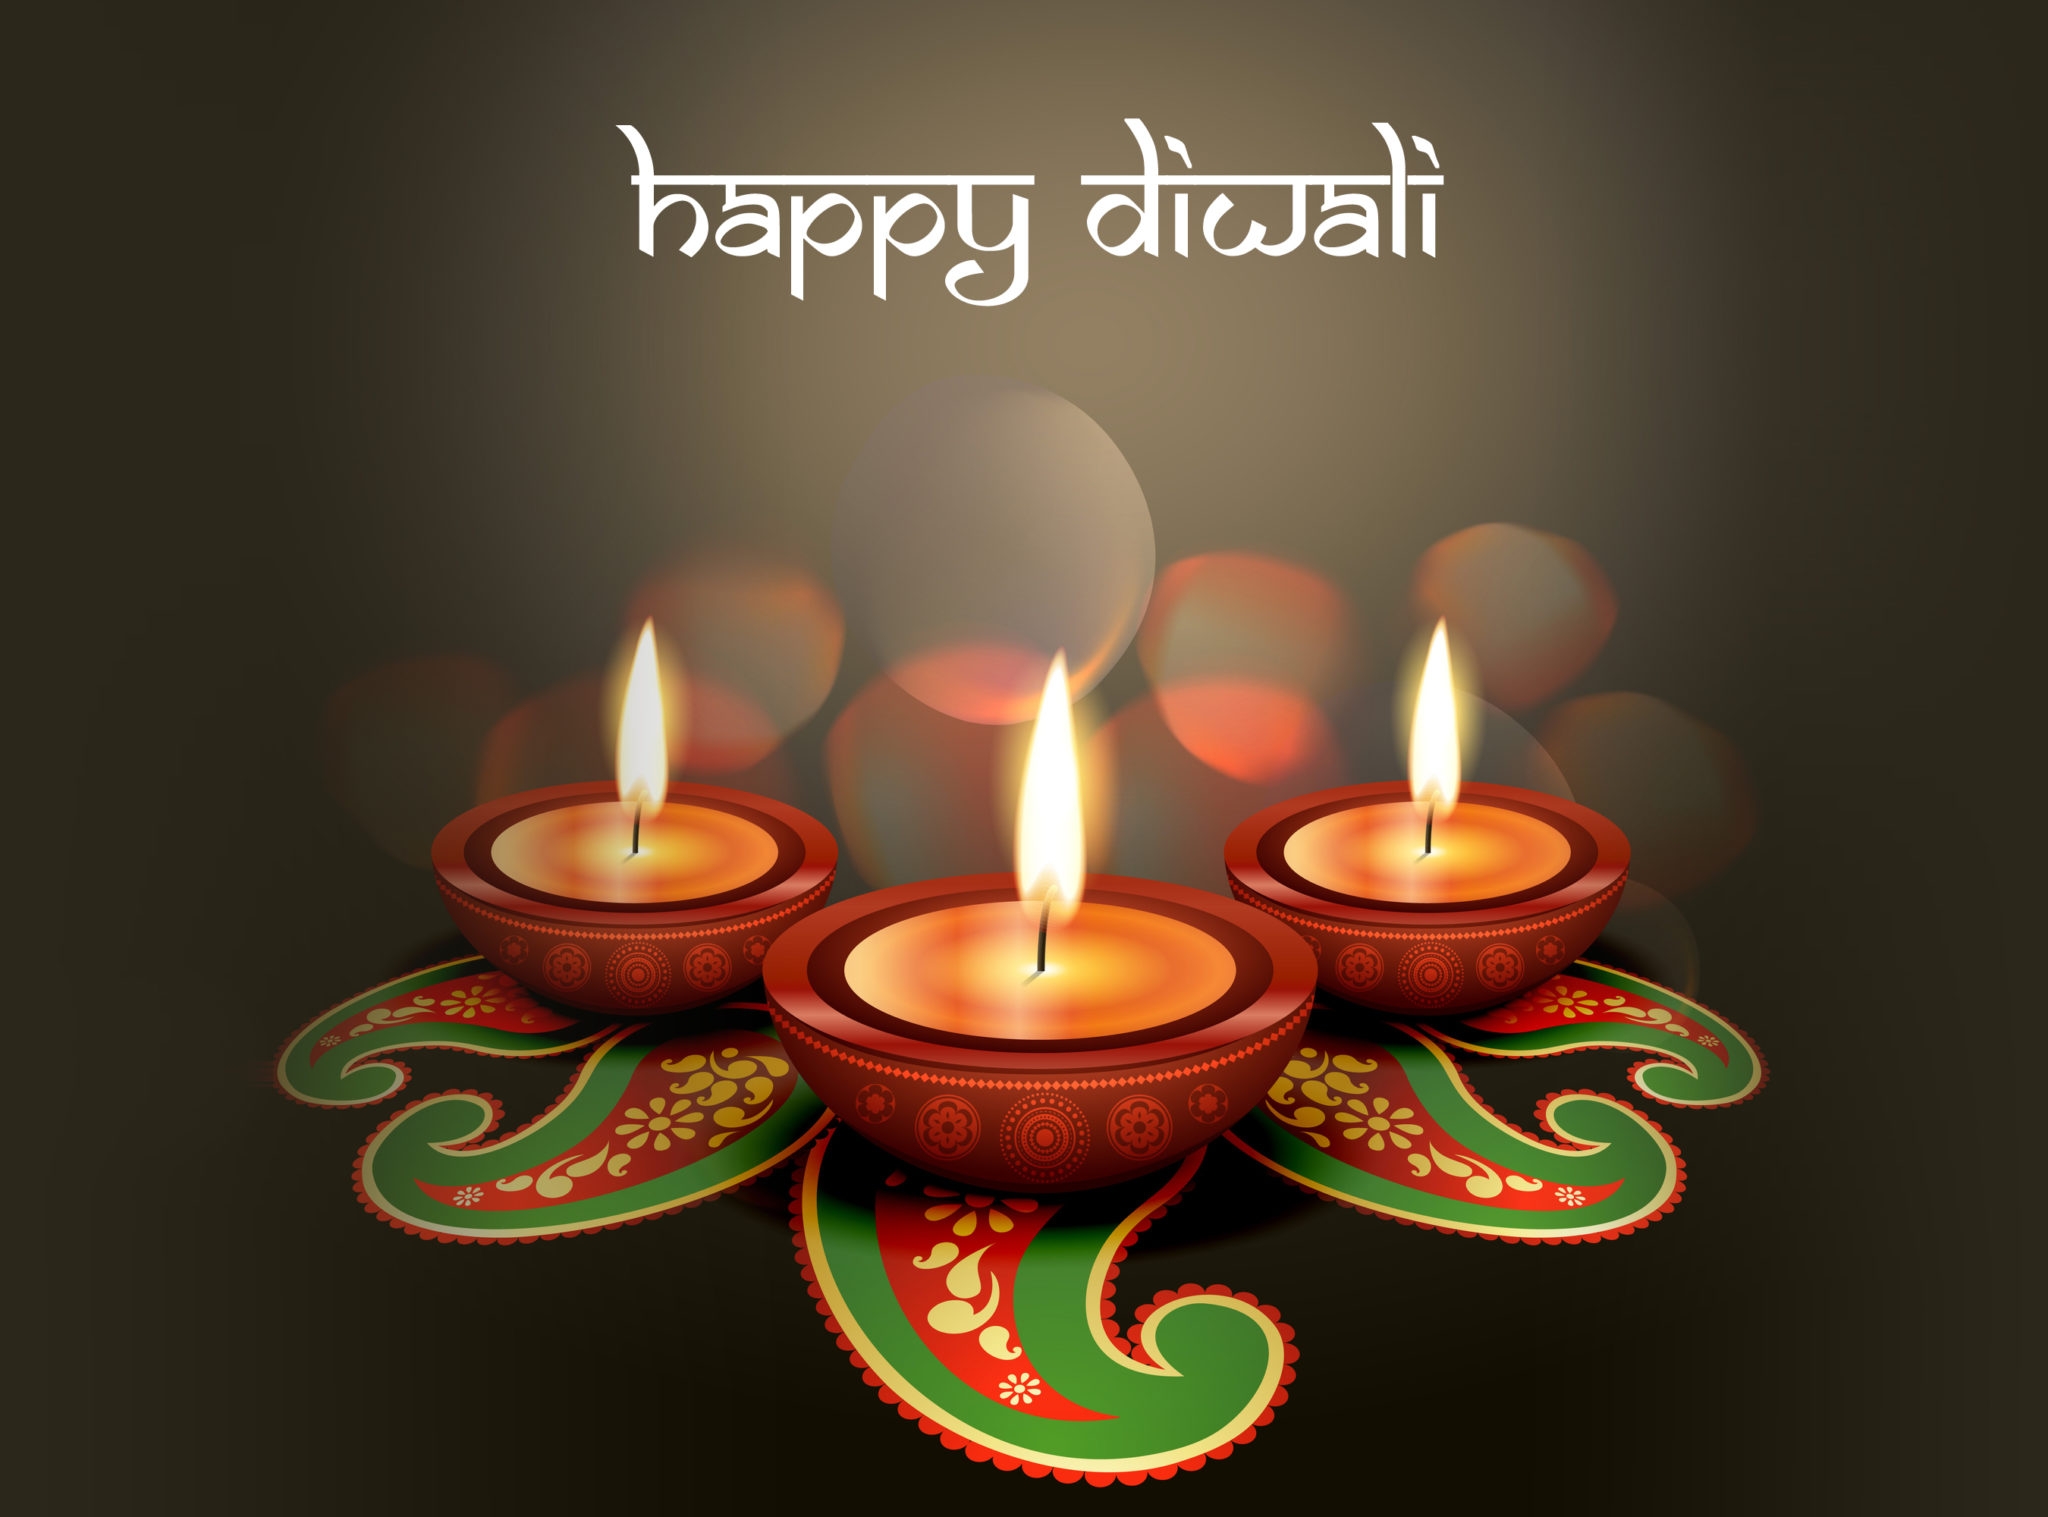 Happy Diwali Images 2018 Diwali Wishes Diwali Greetings Diwali Quotes